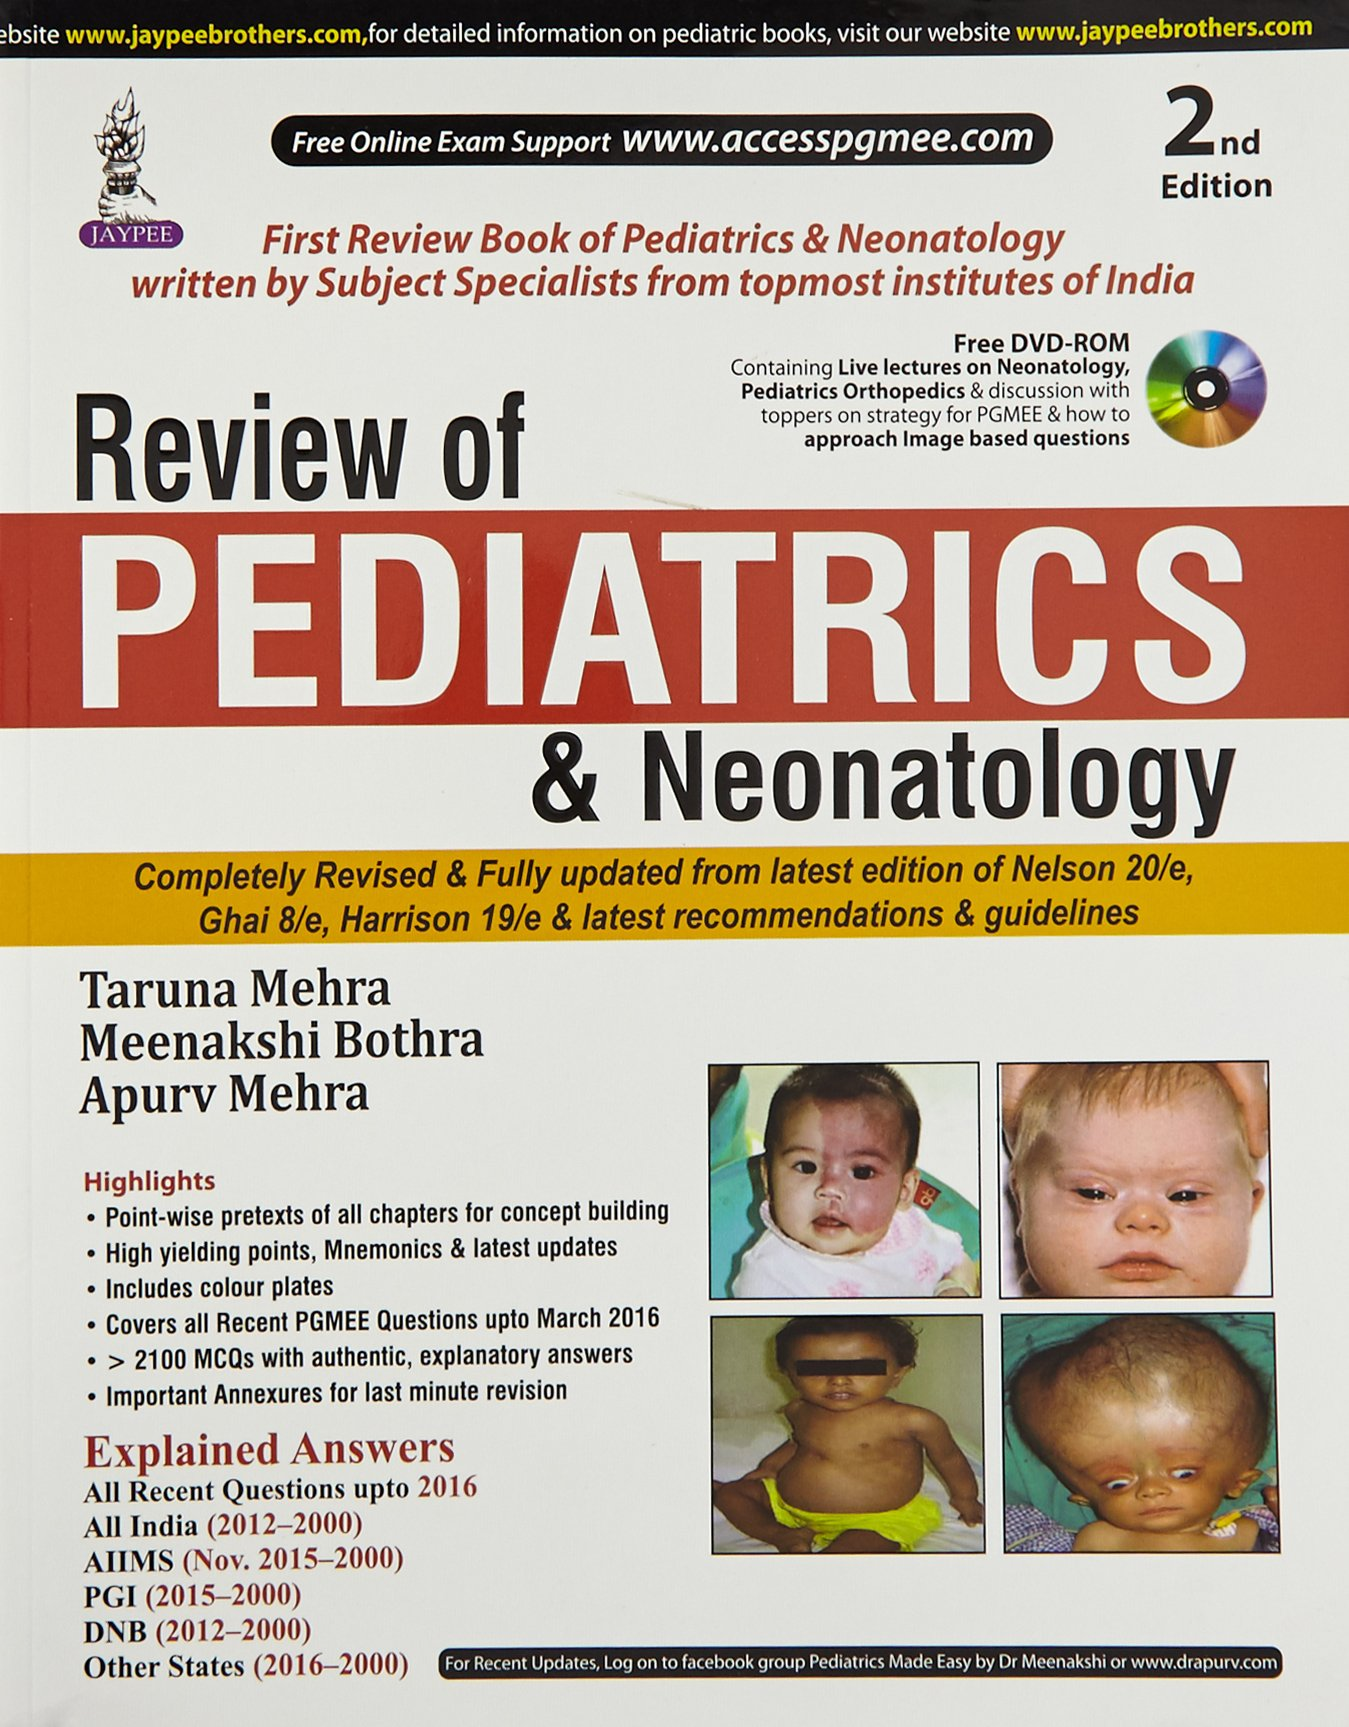 Buy Review Of Pediatrics & Neonatology With Dvd-Rom (PGMEE